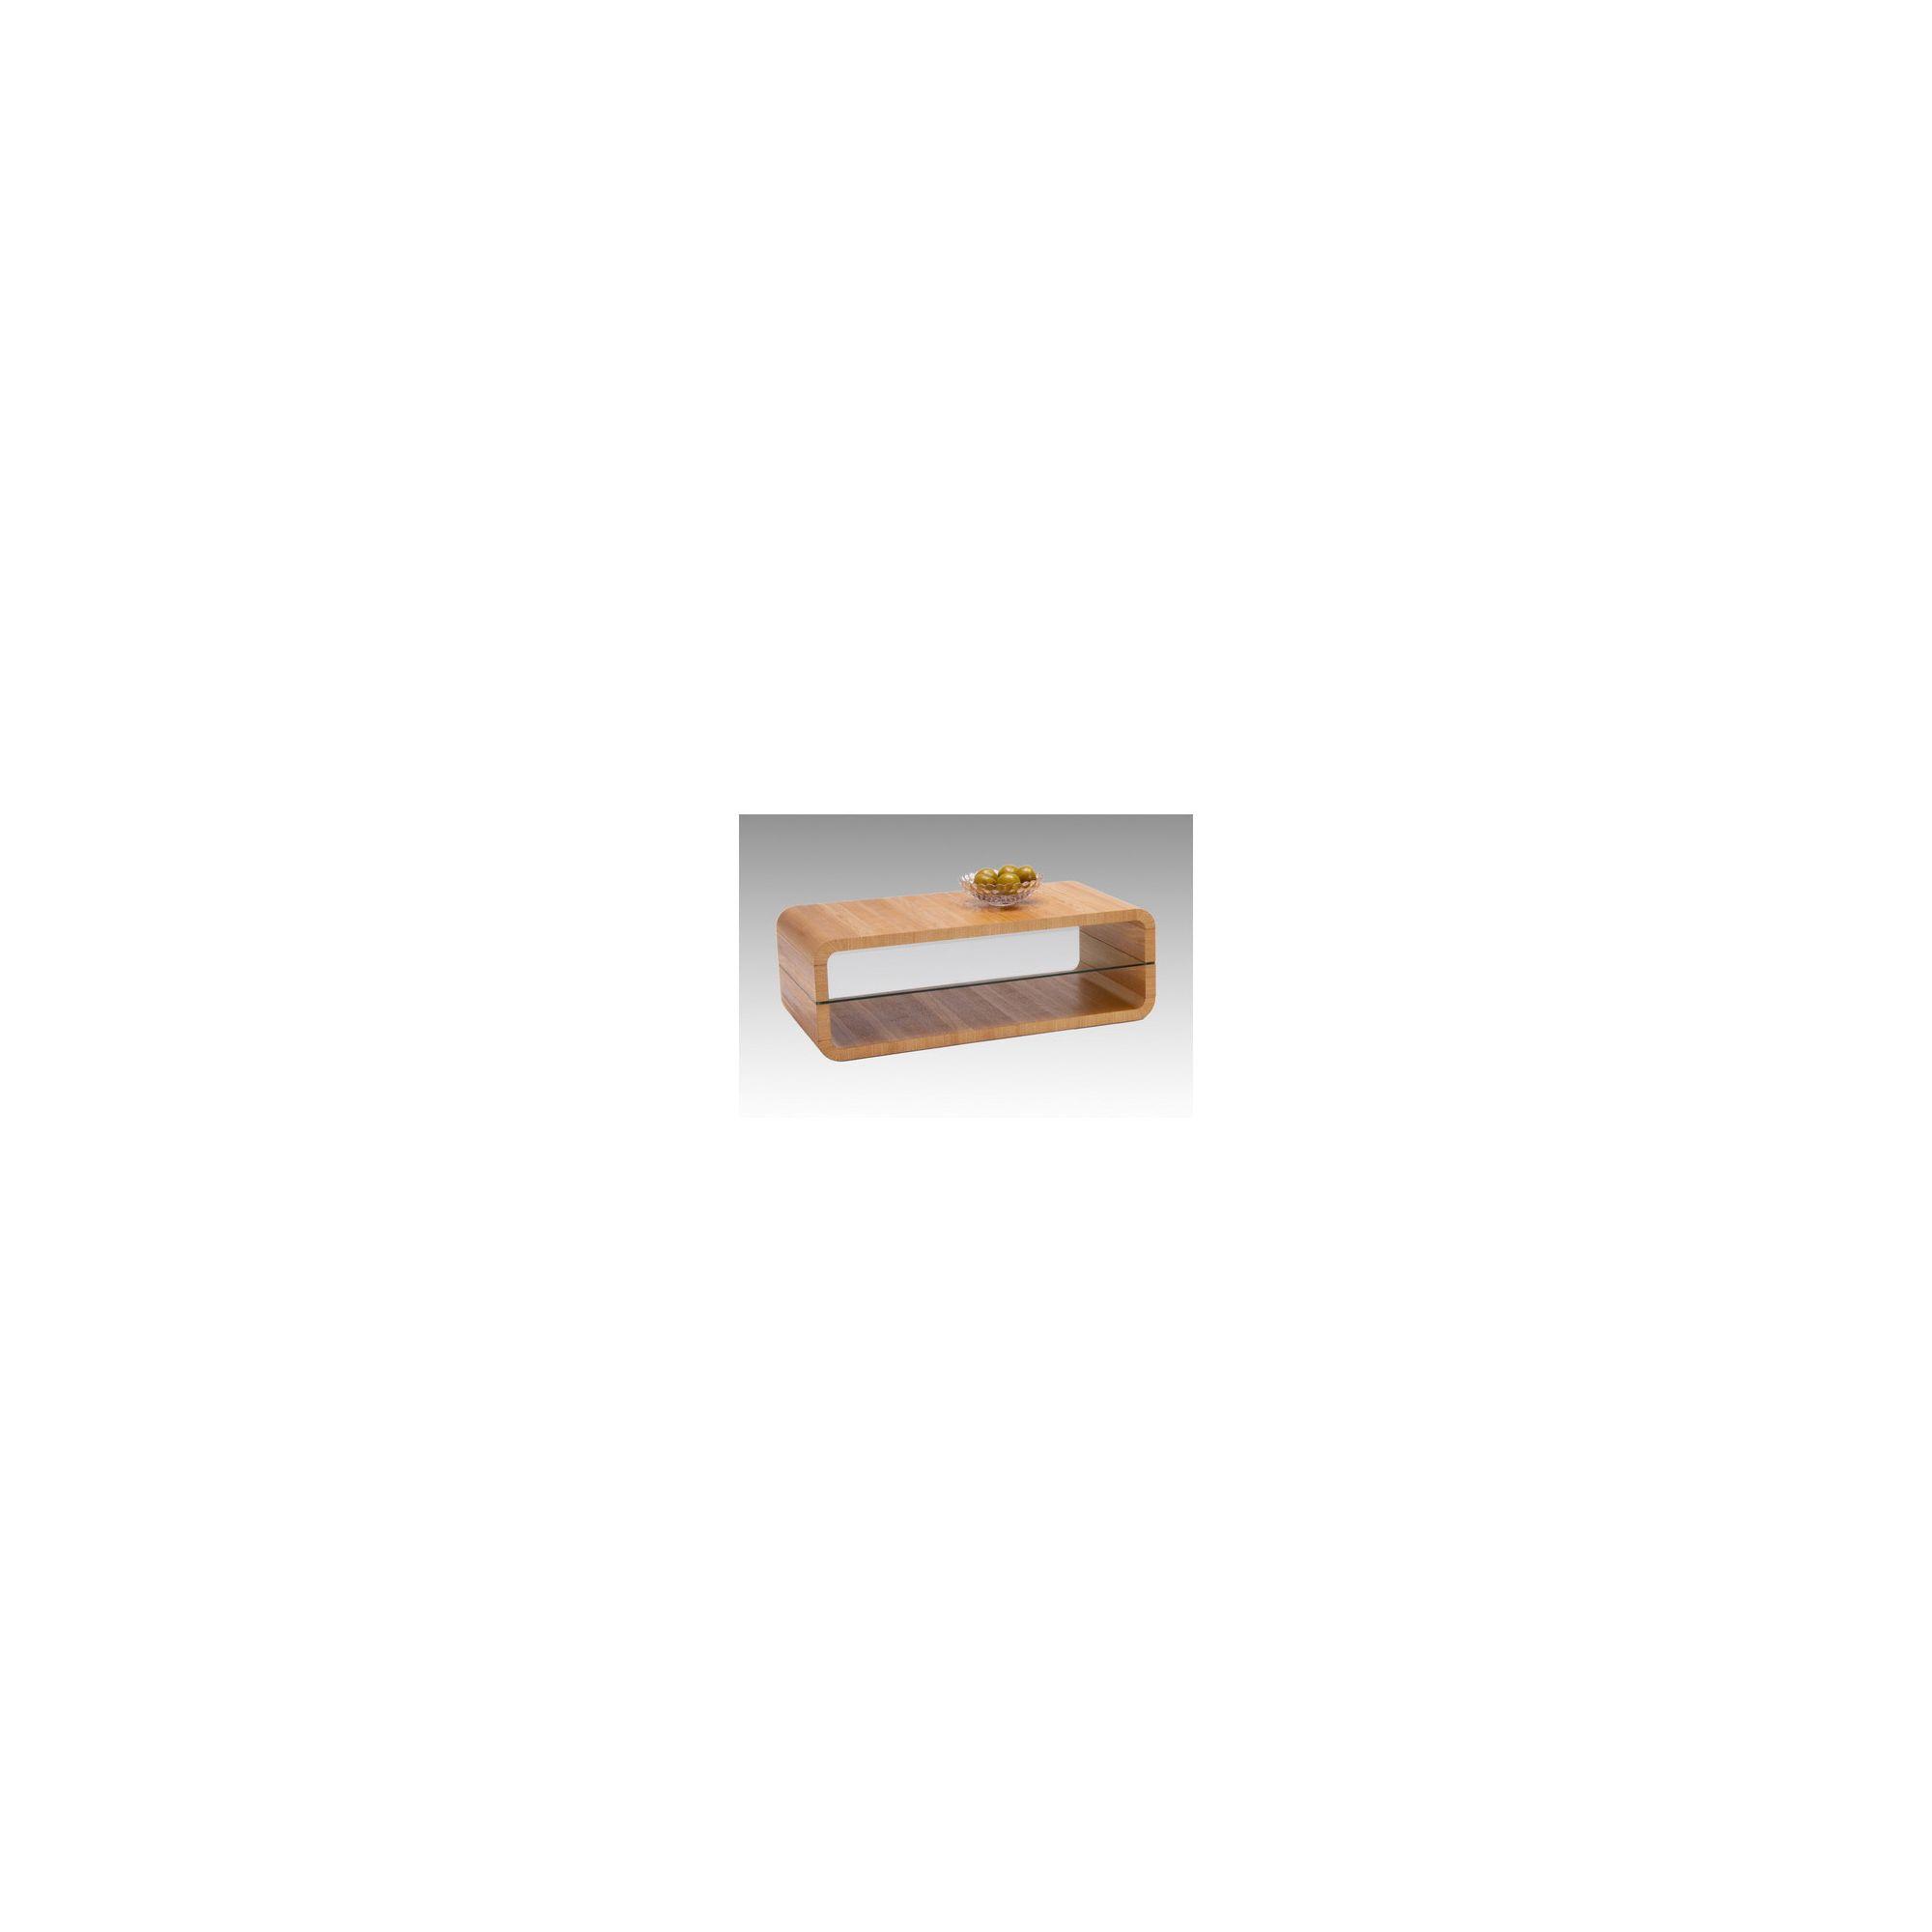 Solway Furniture Triton Coffee Table - Ash at Tesco Direct